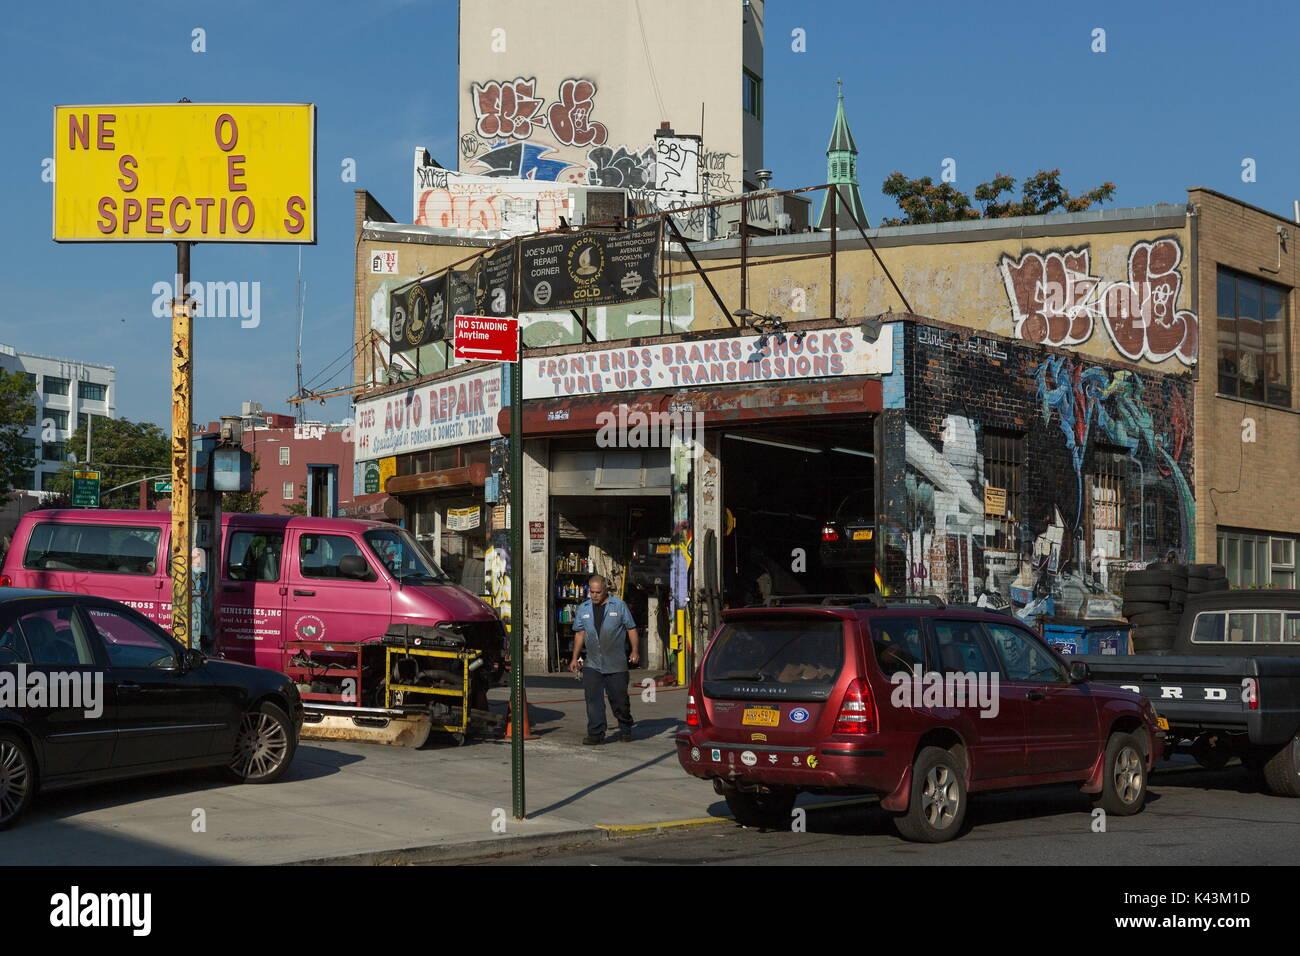 Joes Auto Repair >> Joe S Auto Repair On North 6th Street And Meeker Avenue In